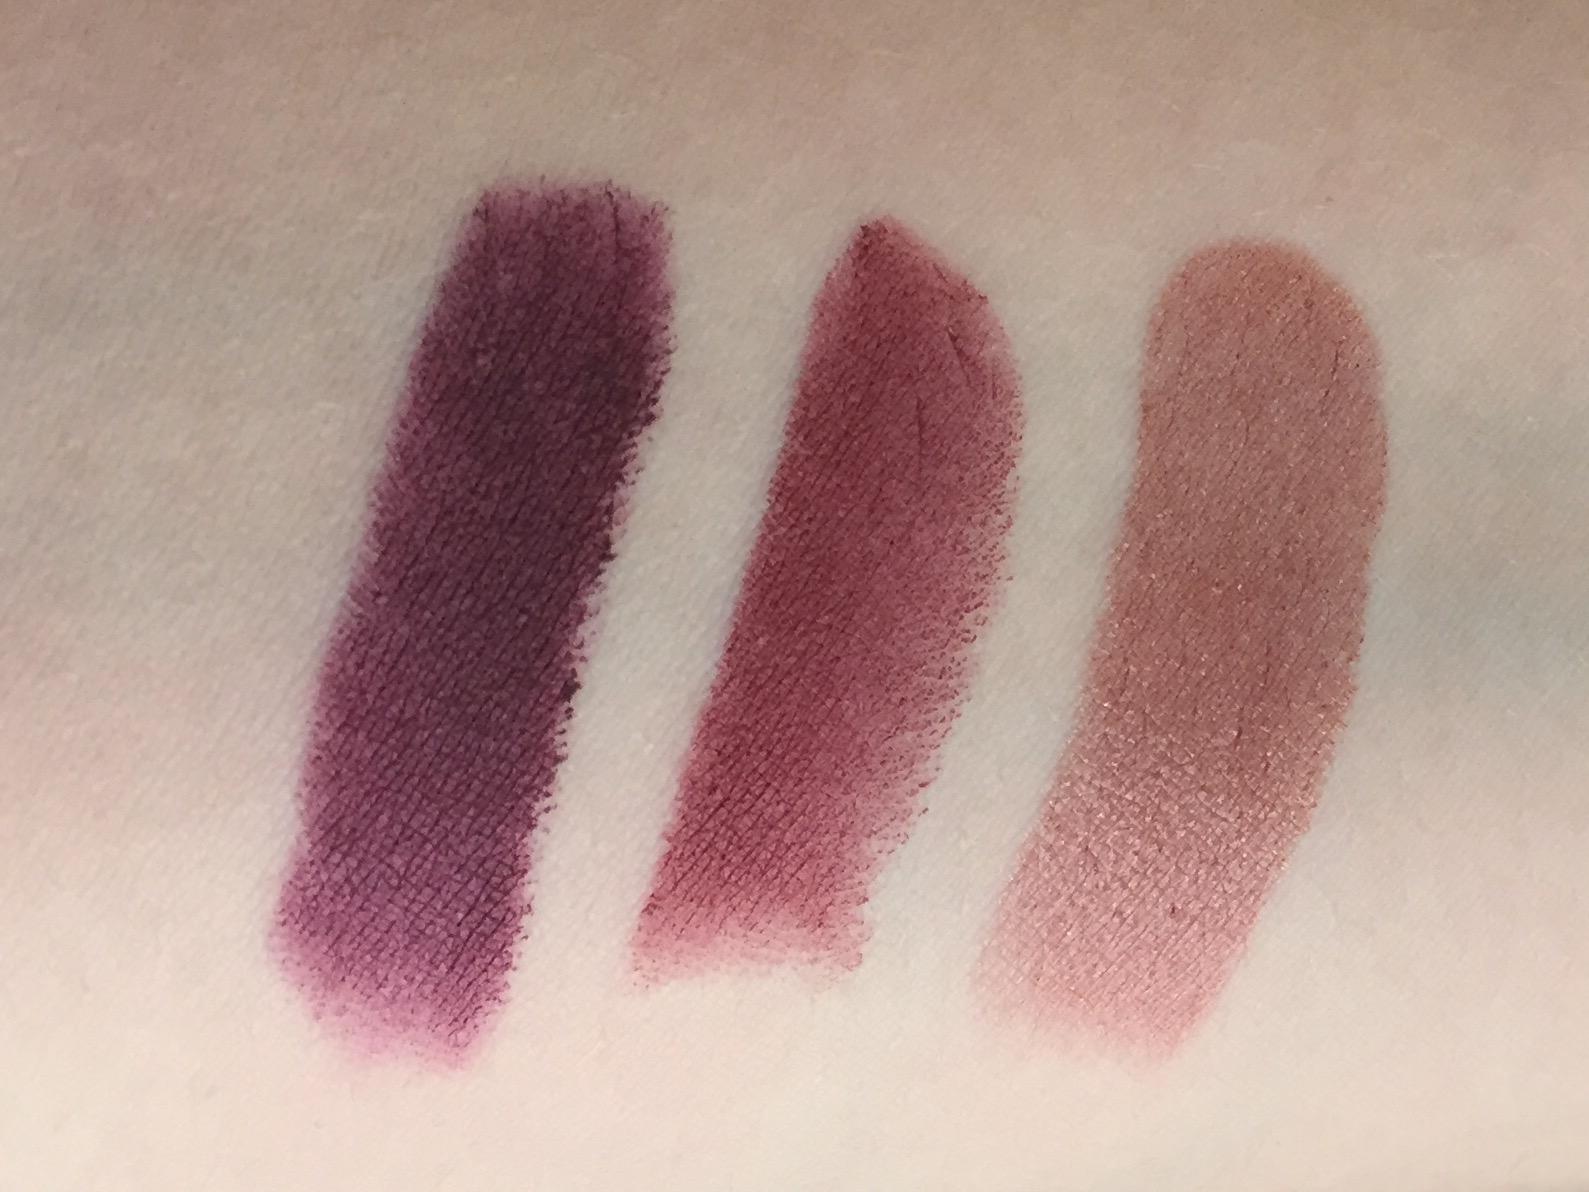 Lipstick by NARS #5